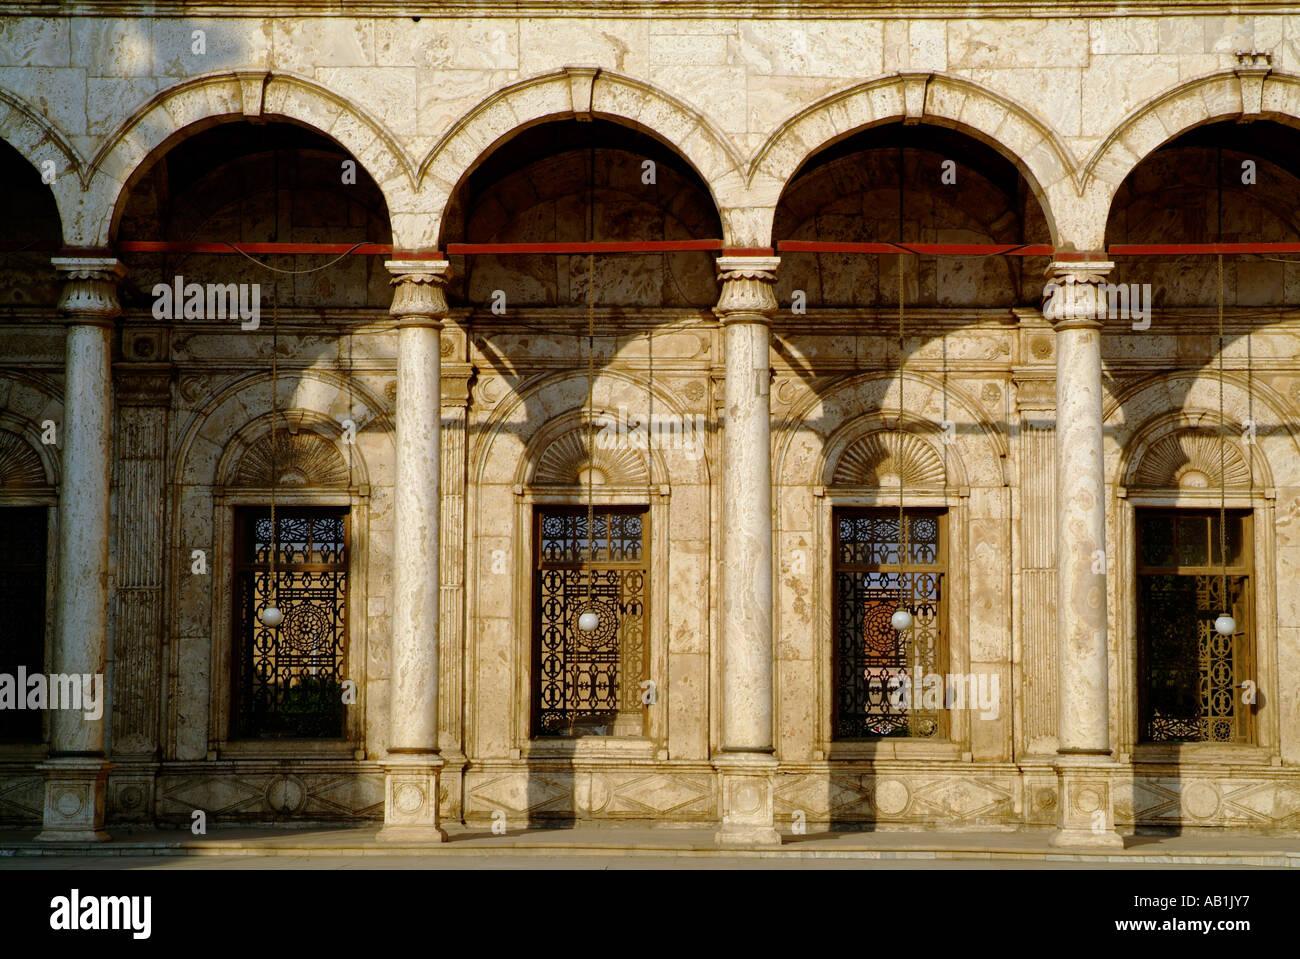 Muhammad Ali Mosque,Citadel,Cairo,Egypt. - Stock Image